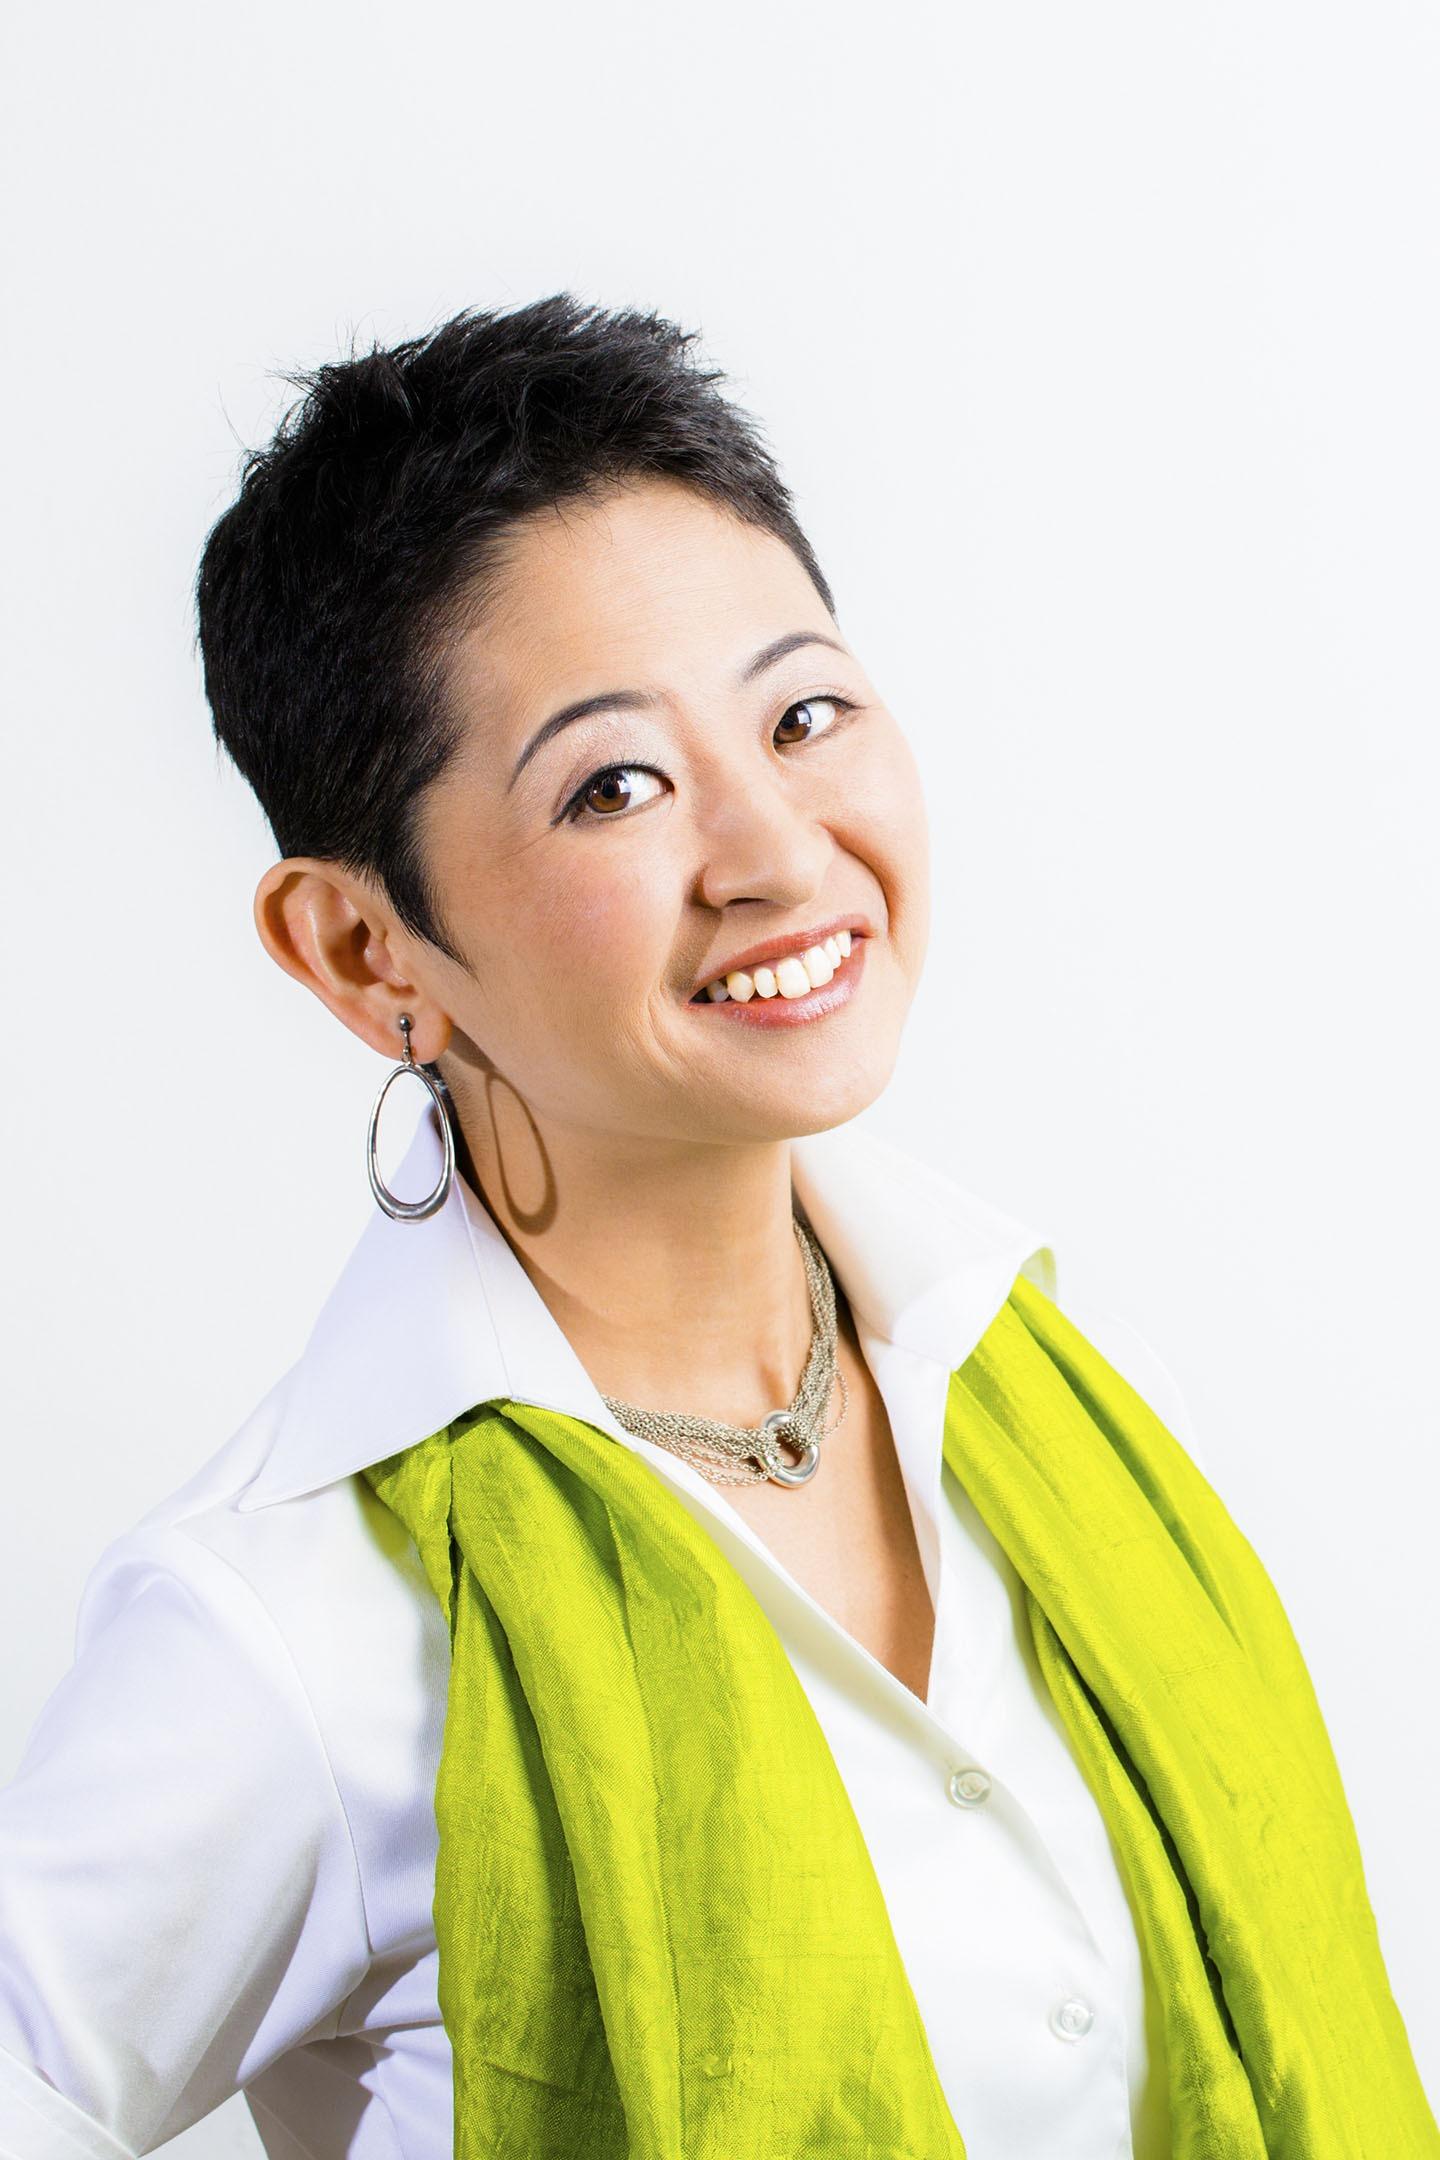 Testimonial from Image Consultant Kanako Mori